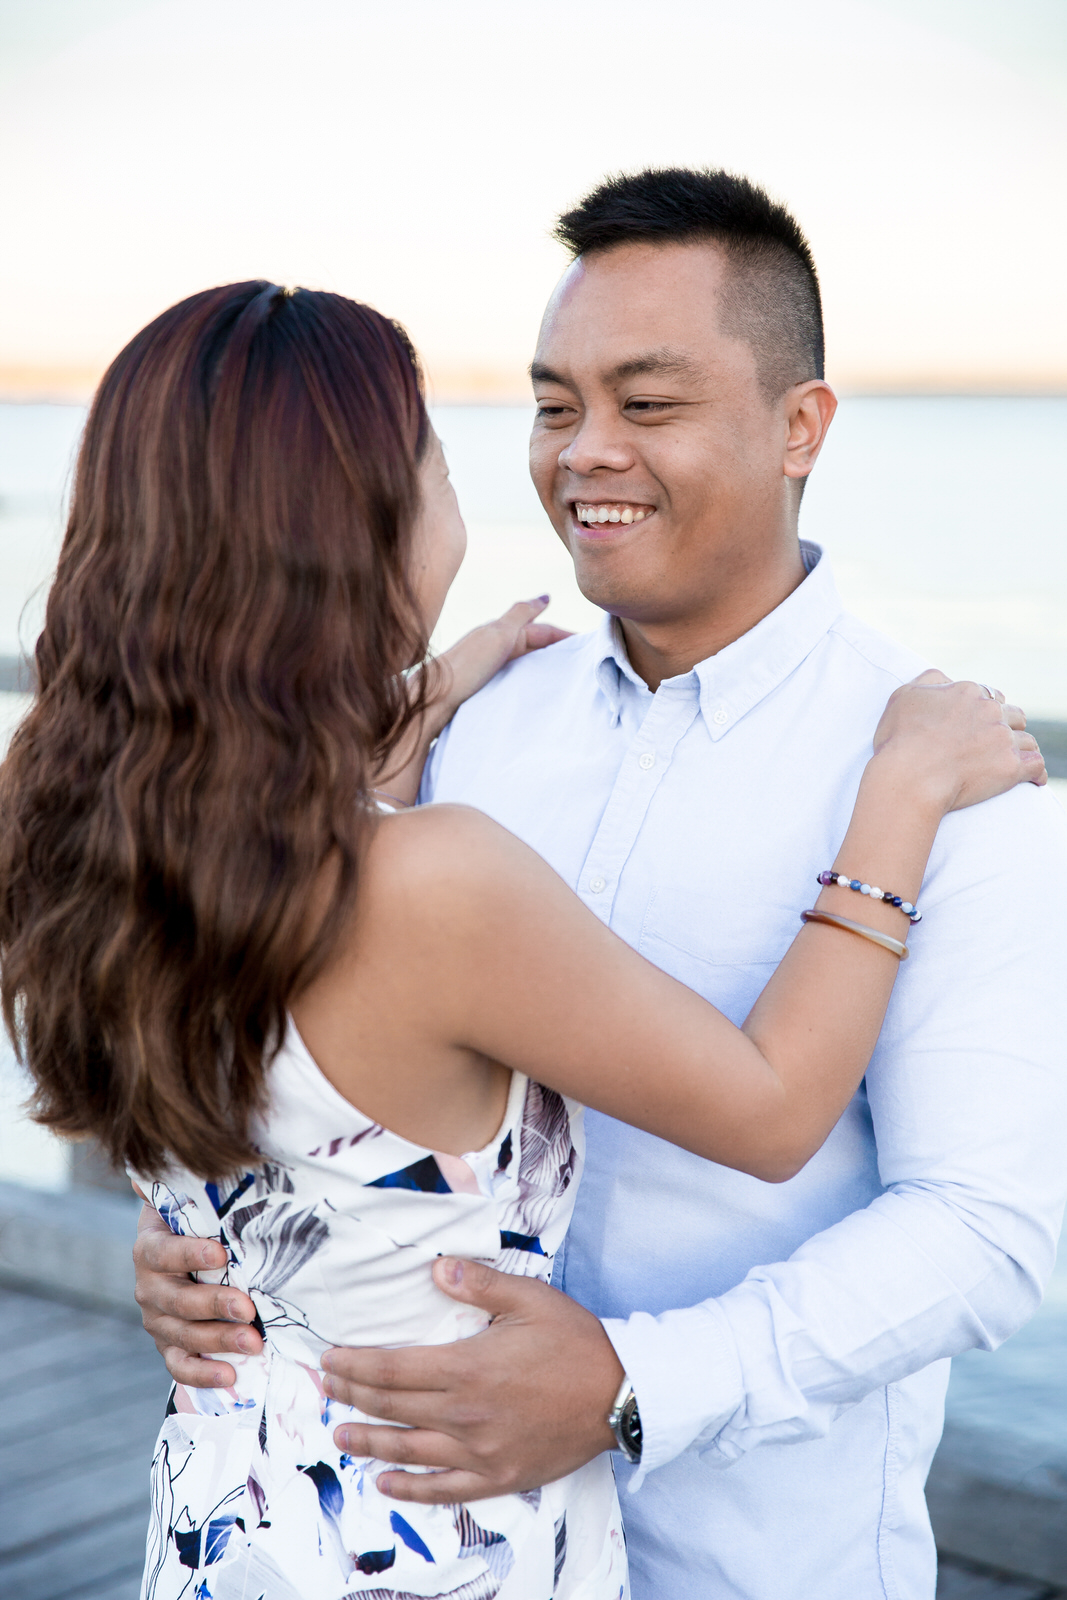 Sydney Engagement Pre-Wedding Photography Session - Jennifer Lam Photography - La Perouse (10).jpg